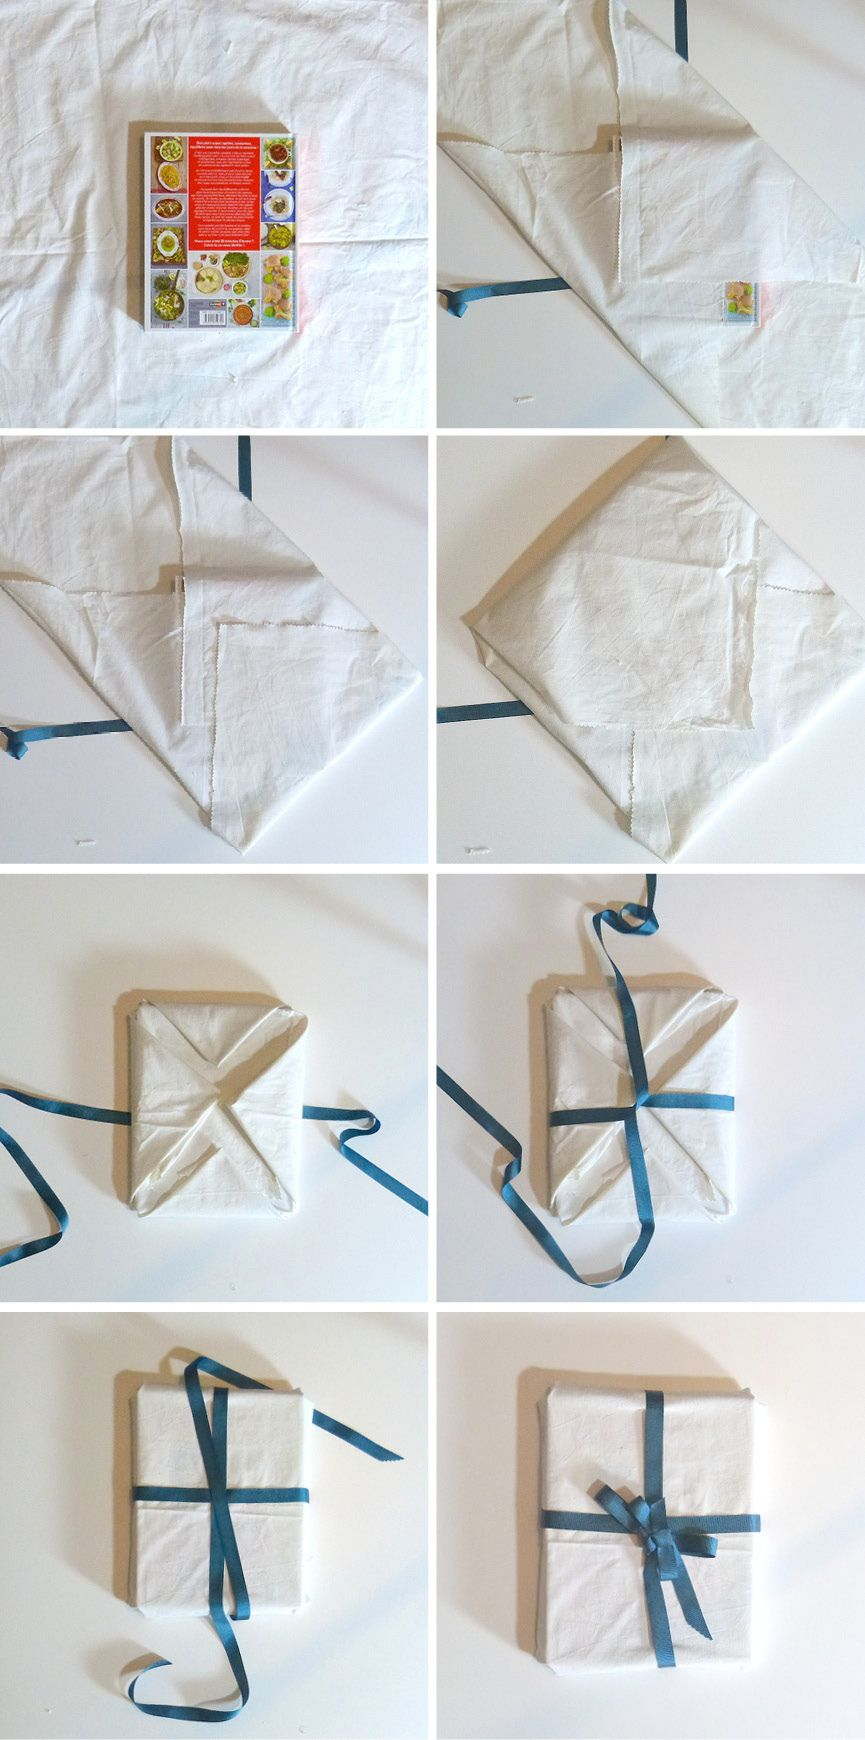 Emballer Ses Cadeaux Avec Du Tissu : emballer, cadeaux, tissu, Emballer, Cadeaux, Tissu, Furoshiki,, Rouleaux,, Emballage, Japonais